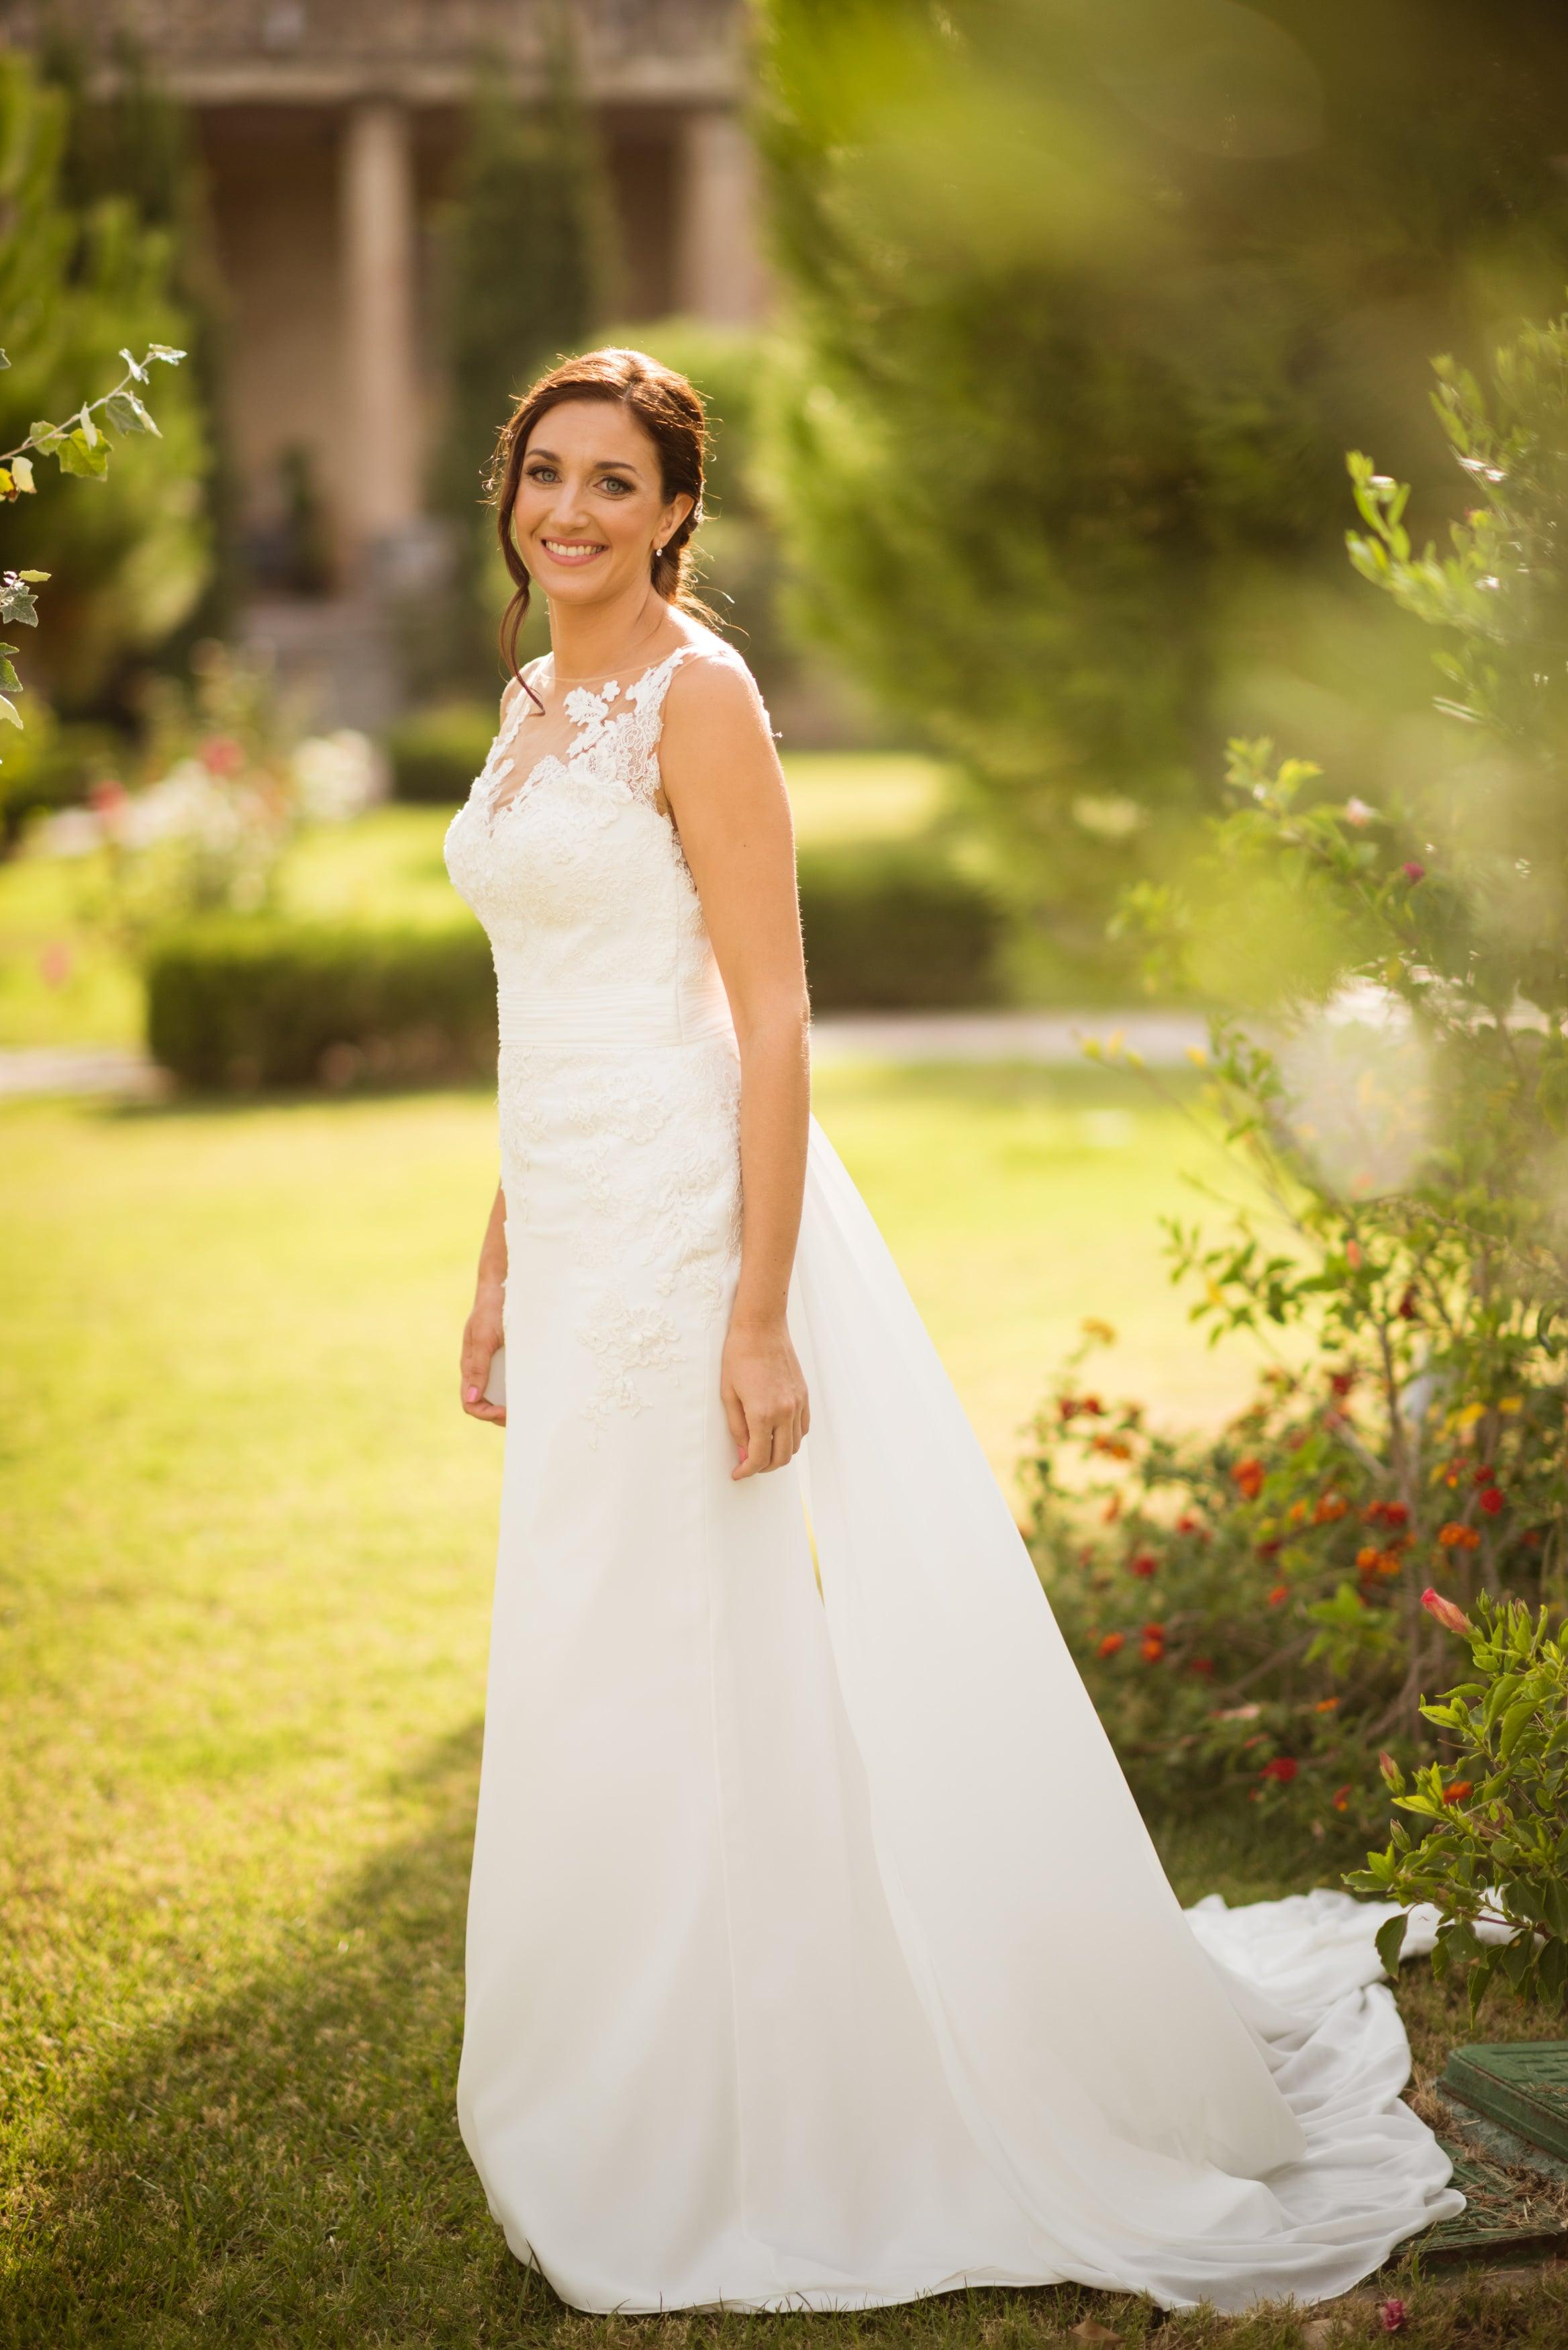 aristocratic-wedding-in-greece-lafete0303-min